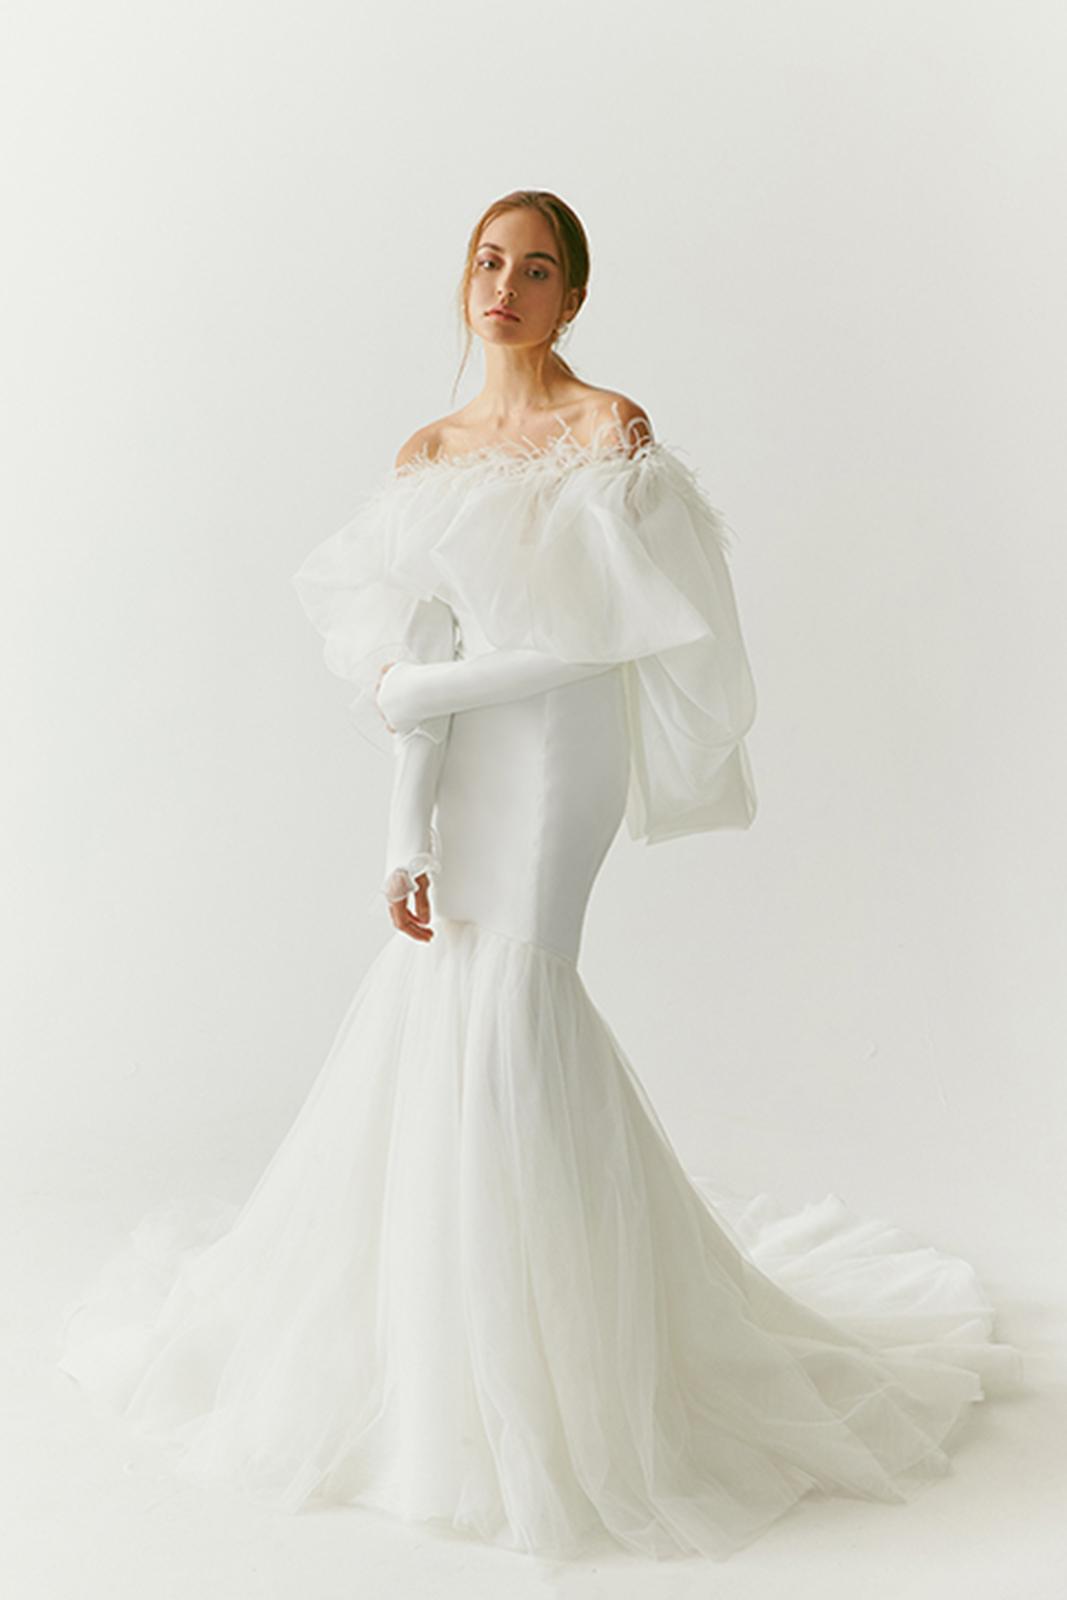 sebastien-luke-wedding-dress